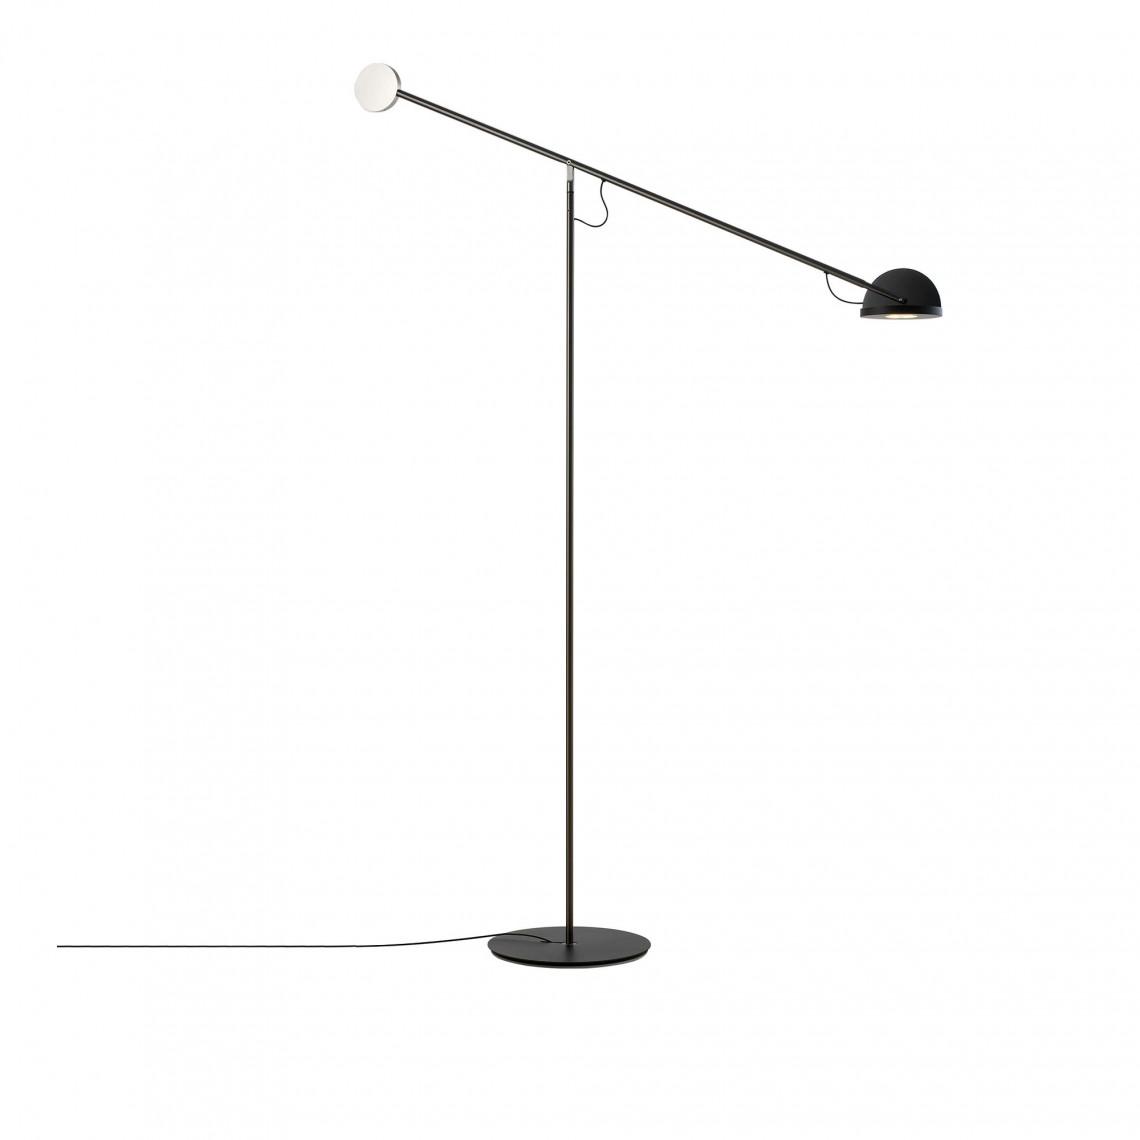 Copernica P - Floor Lamp Matte Chrome/Black